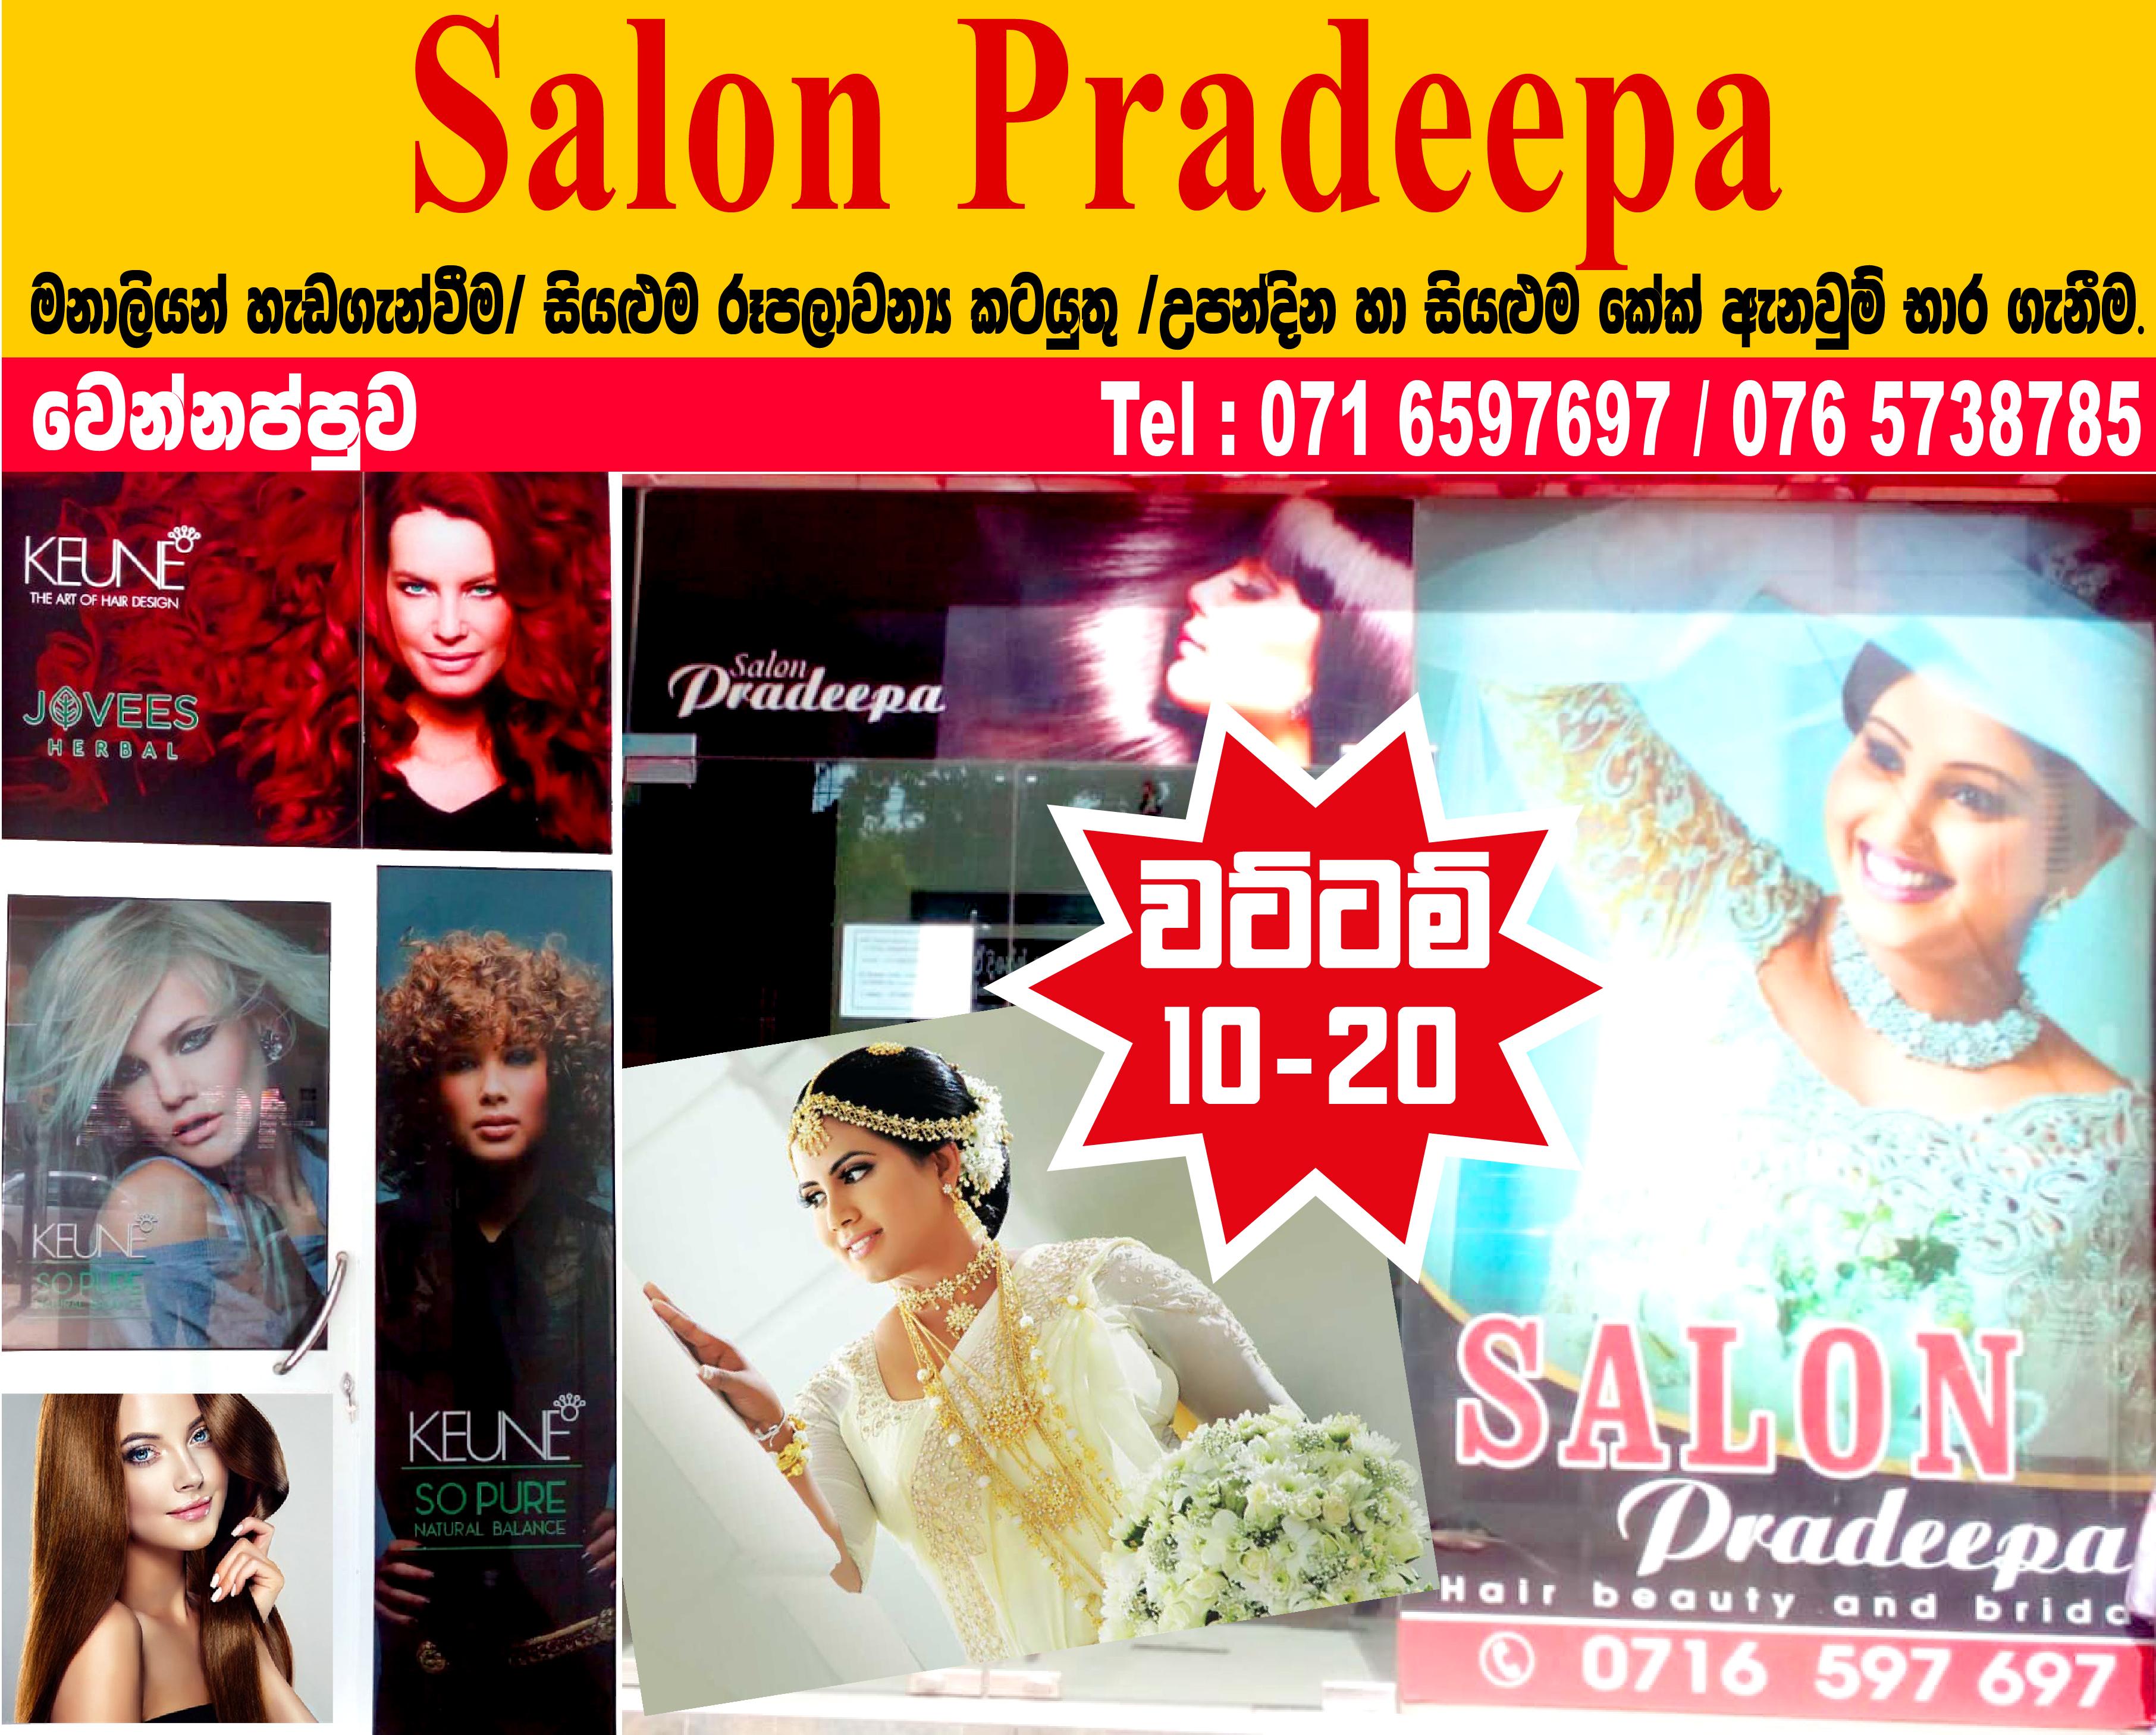 salon pradeepa-01